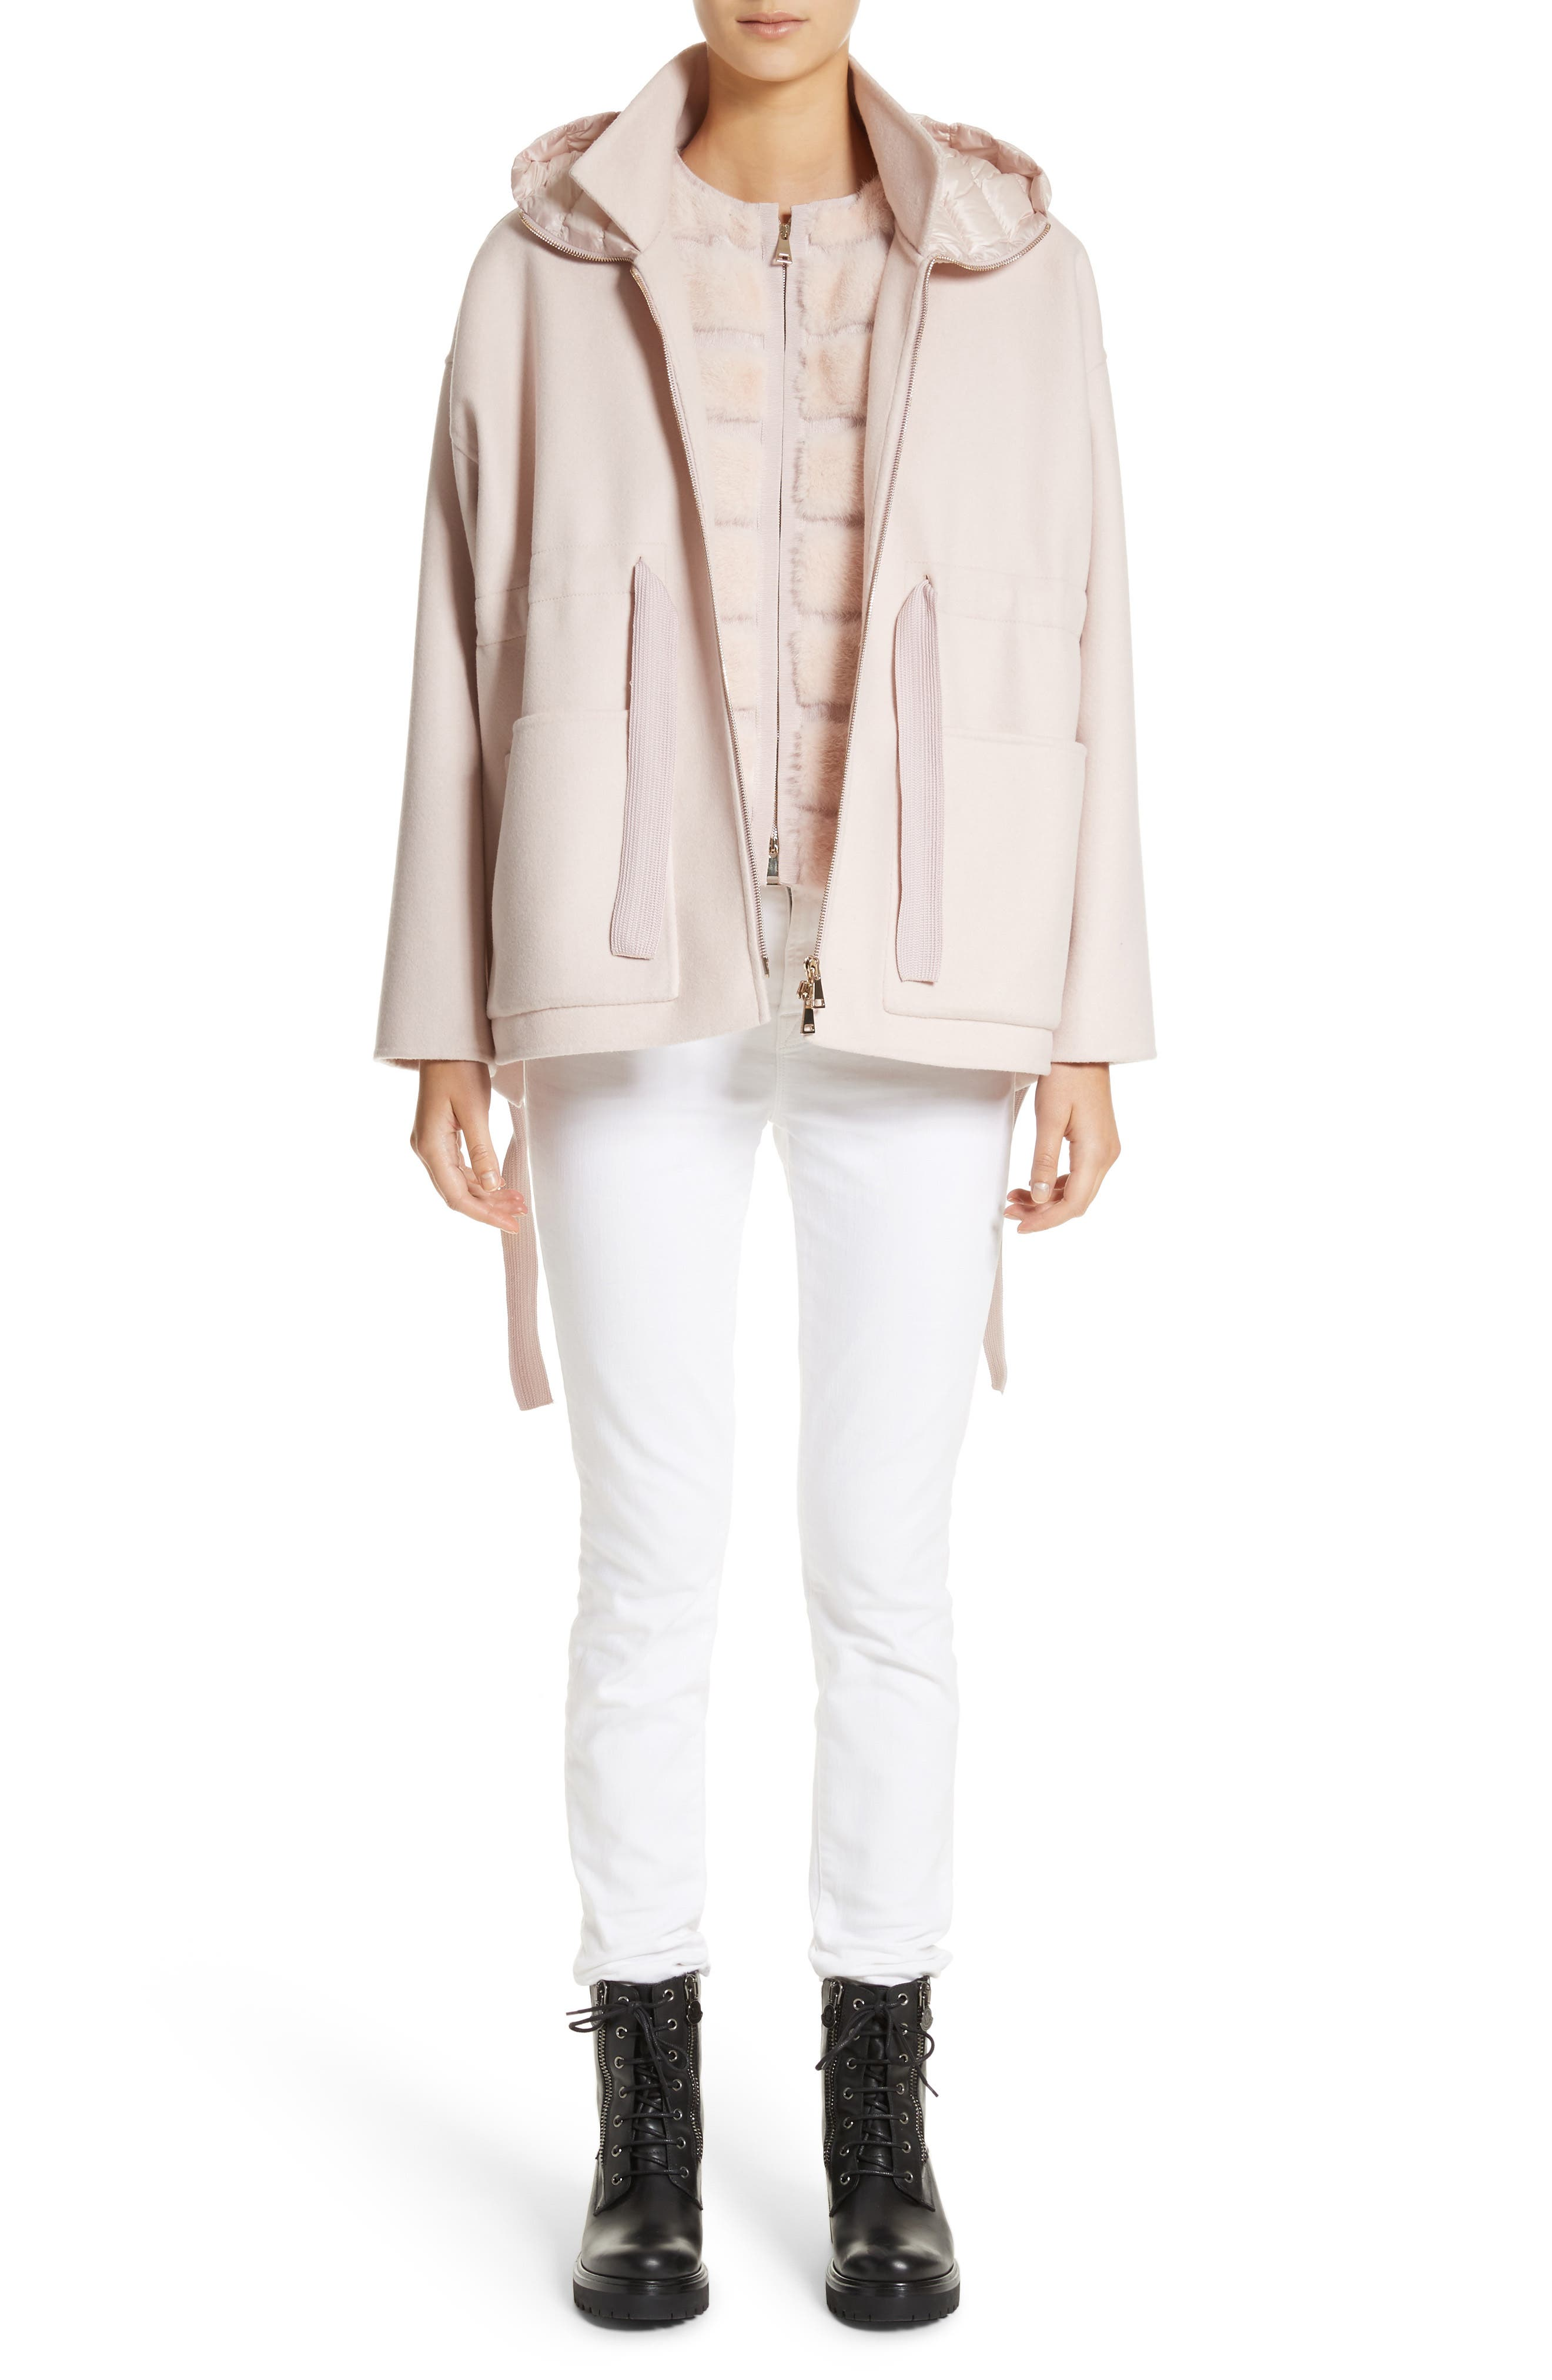 Ametrine Wool & Cashmere Vest with Genuine Mink Fur Trim & Removable Hood,                             Main thumbnail 1, color,                             680